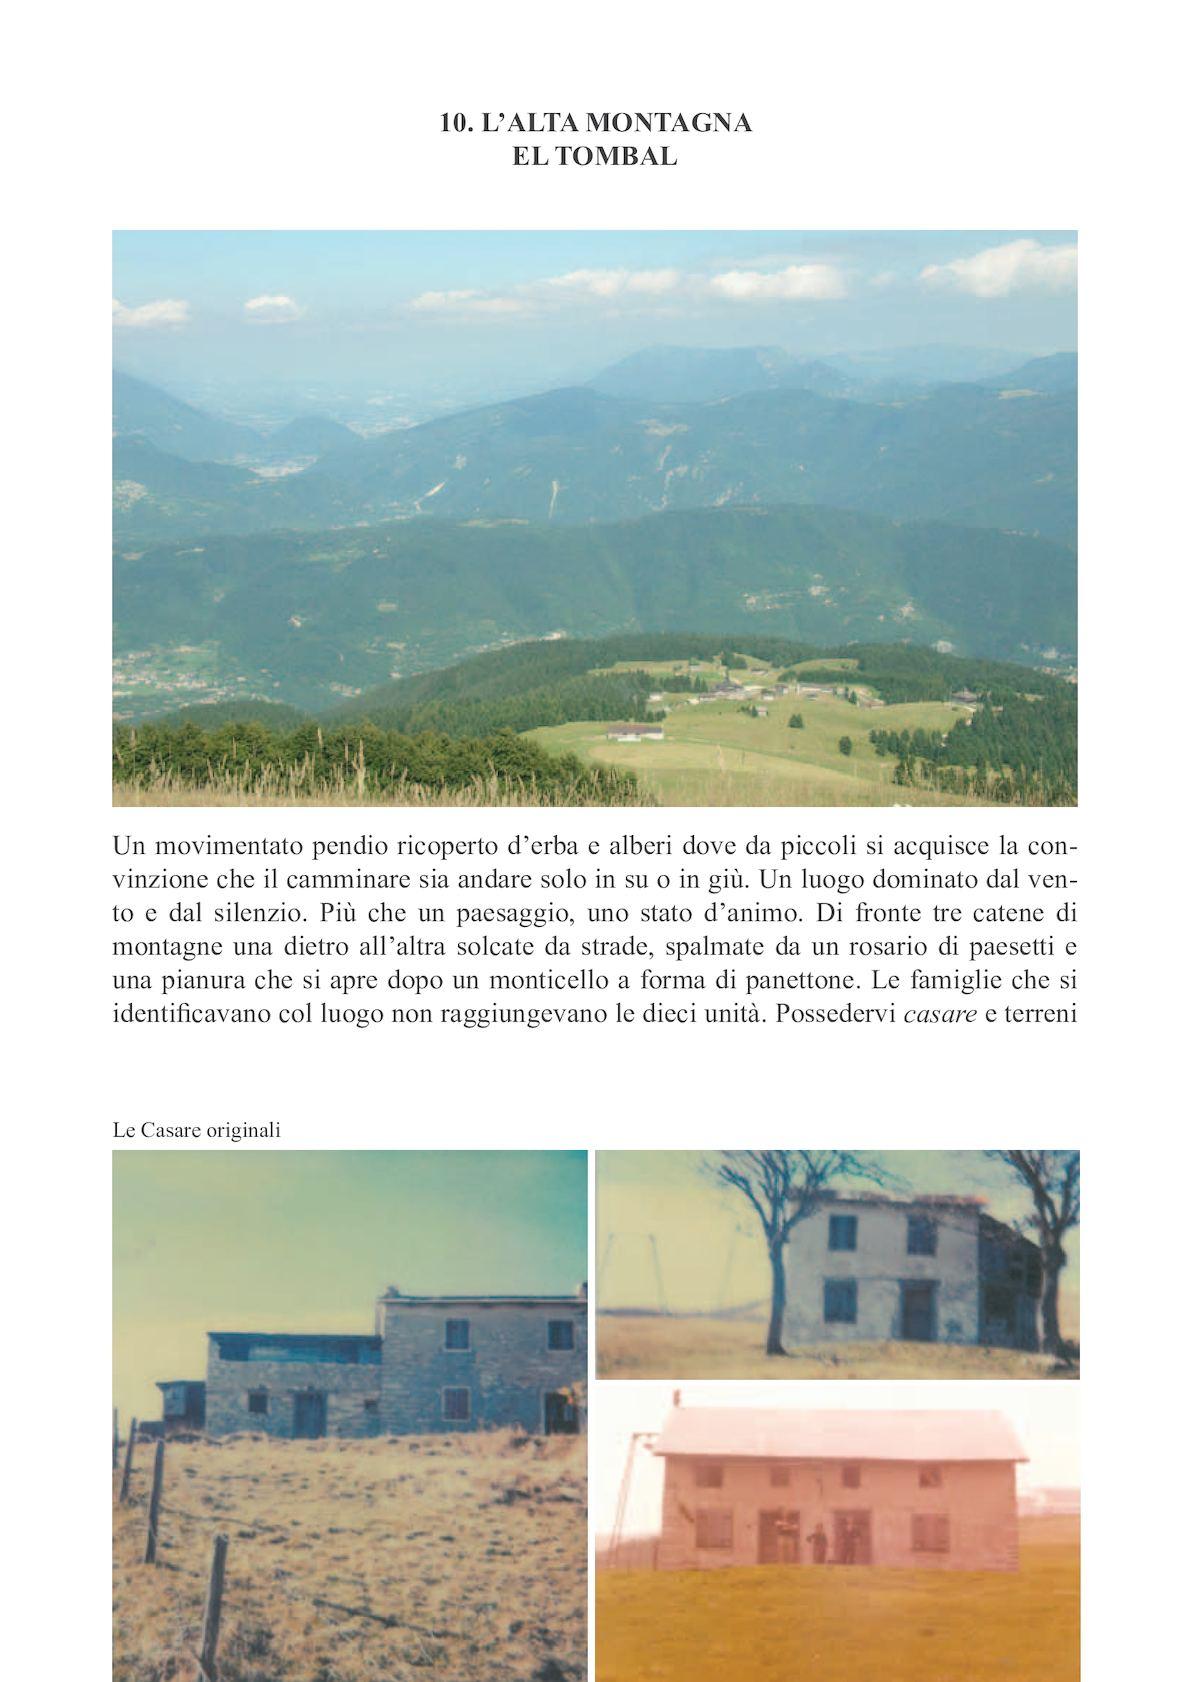 Montagna Legnami Alte Ceccato calaméo - cap10